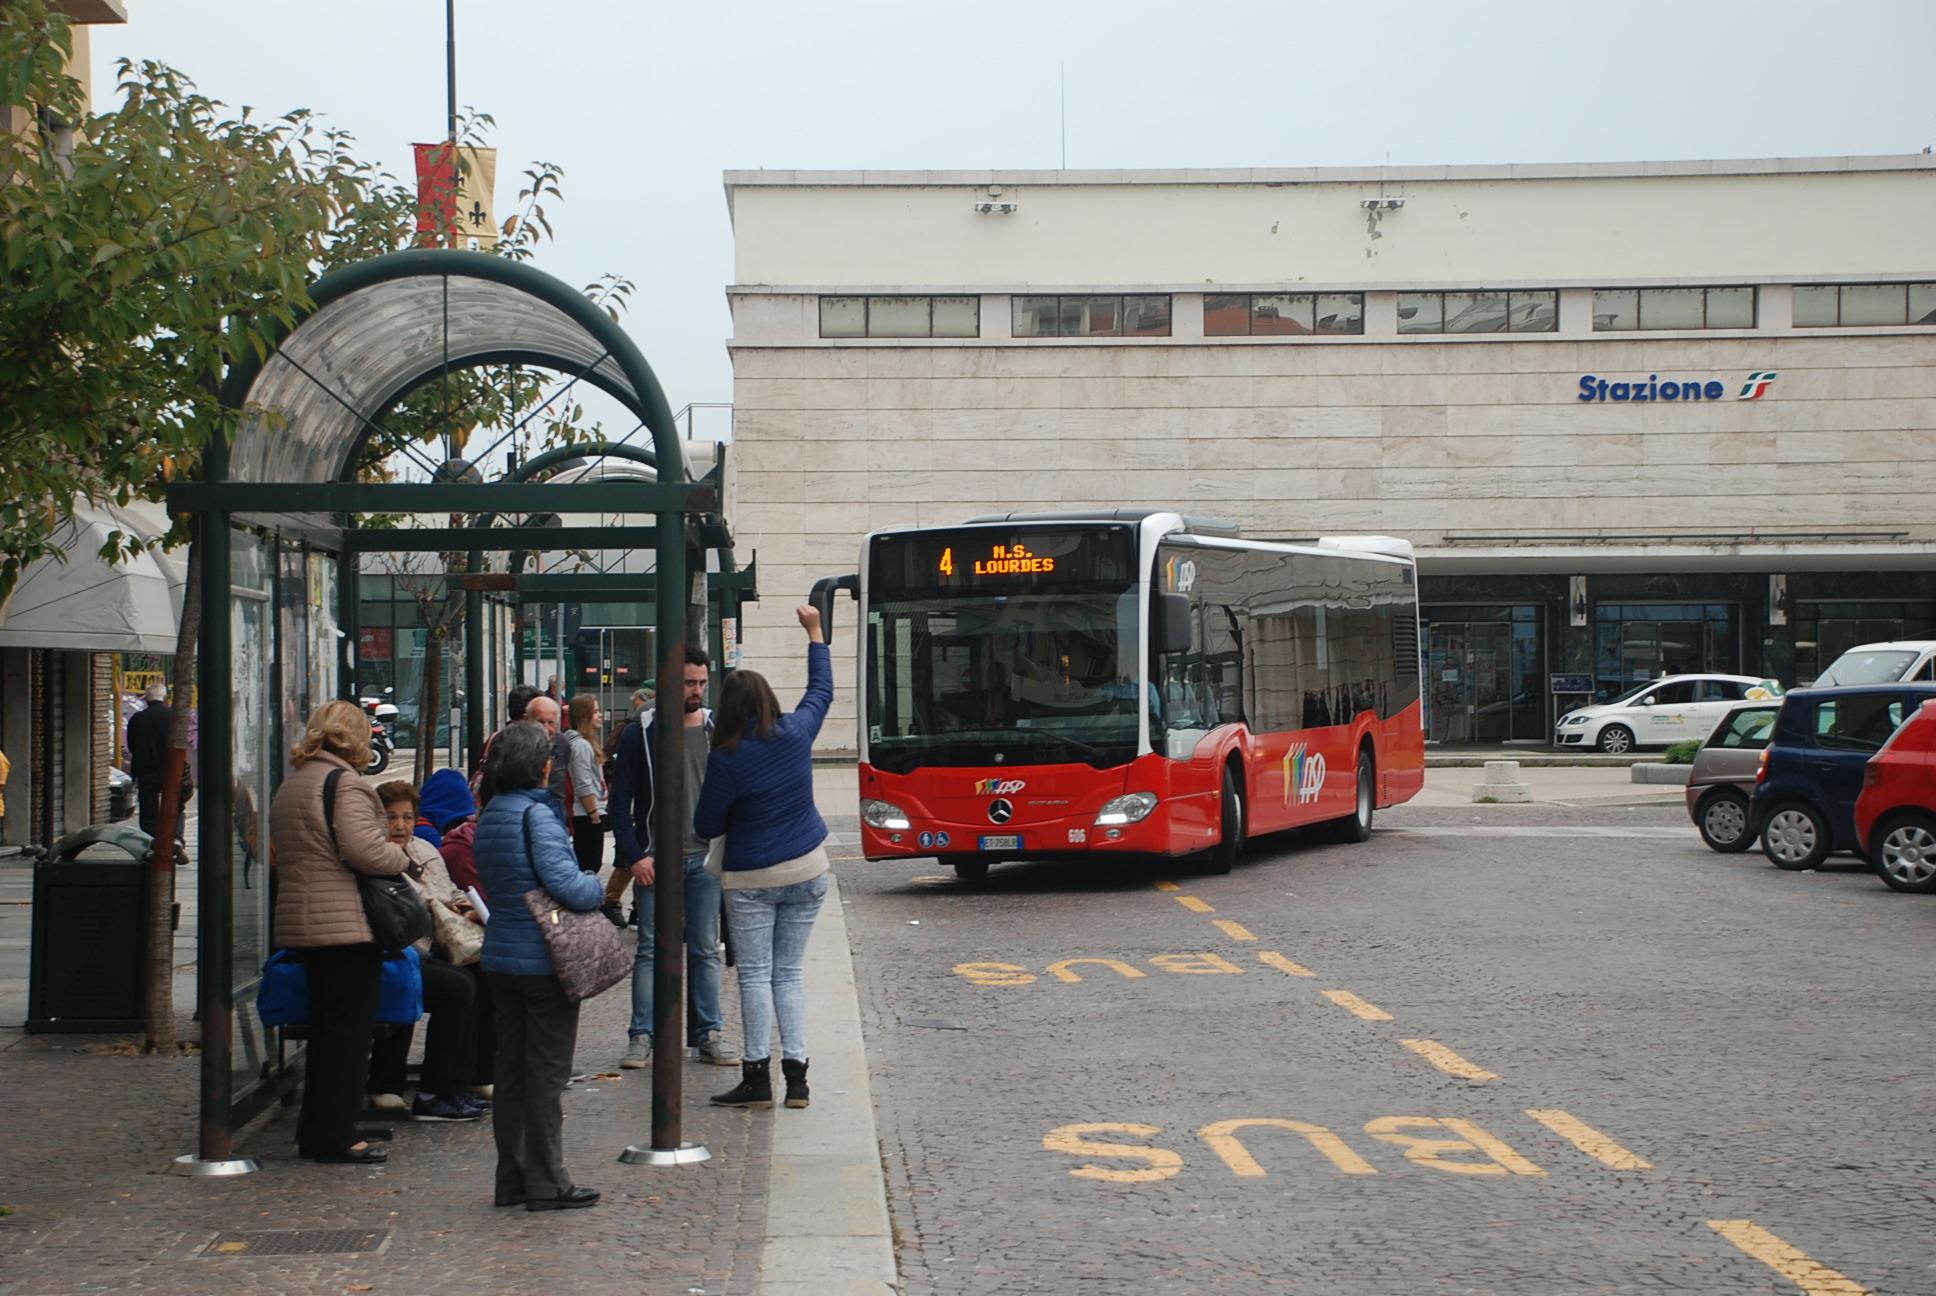 Bus linea 4